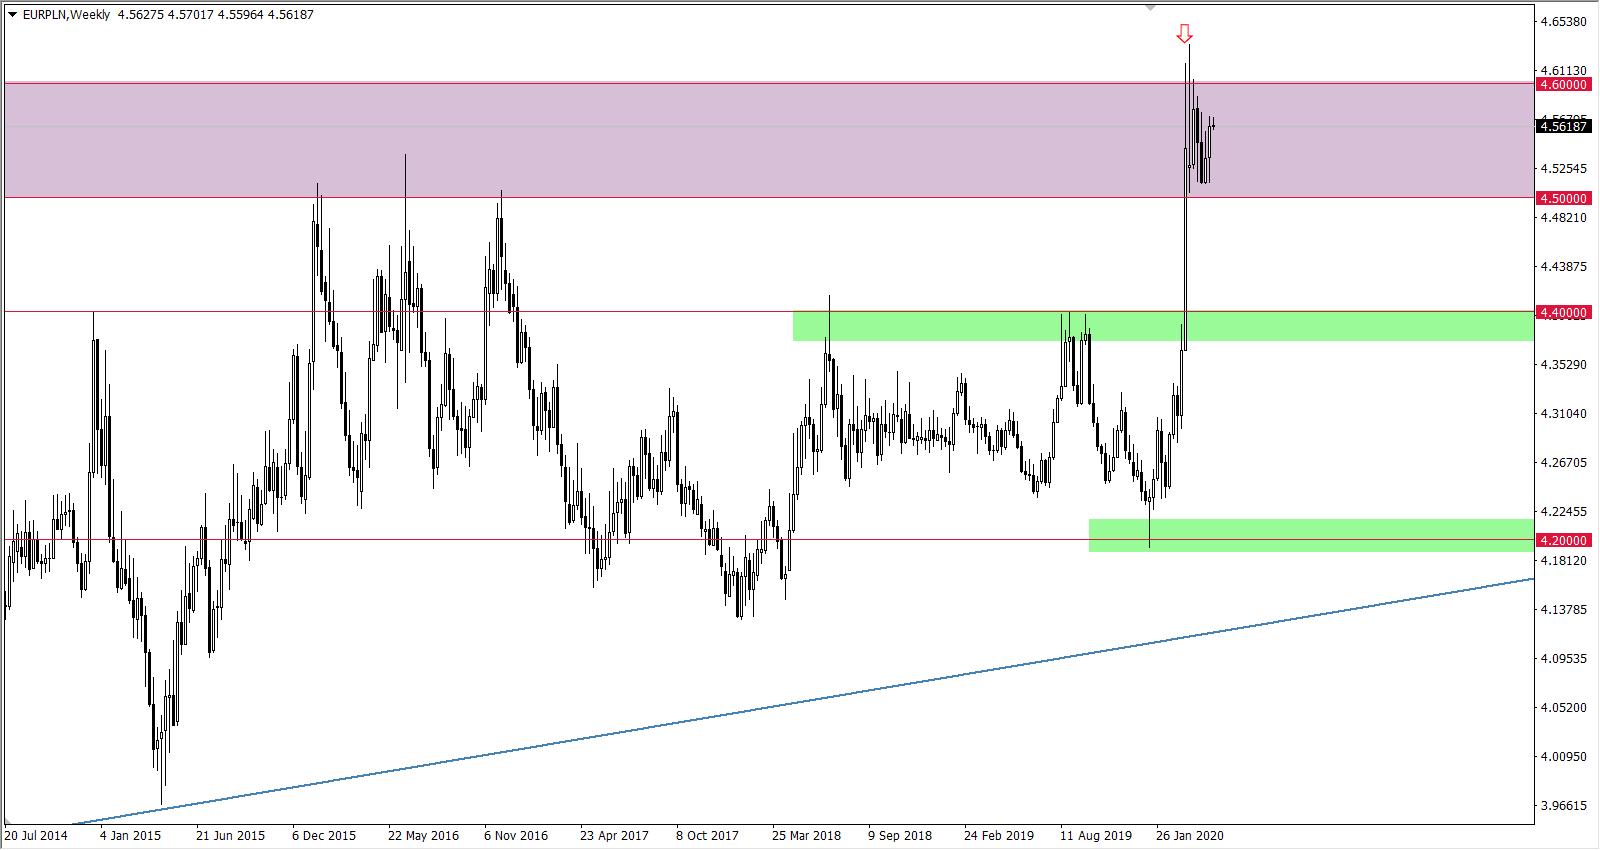 Kurs EURPLN wykres